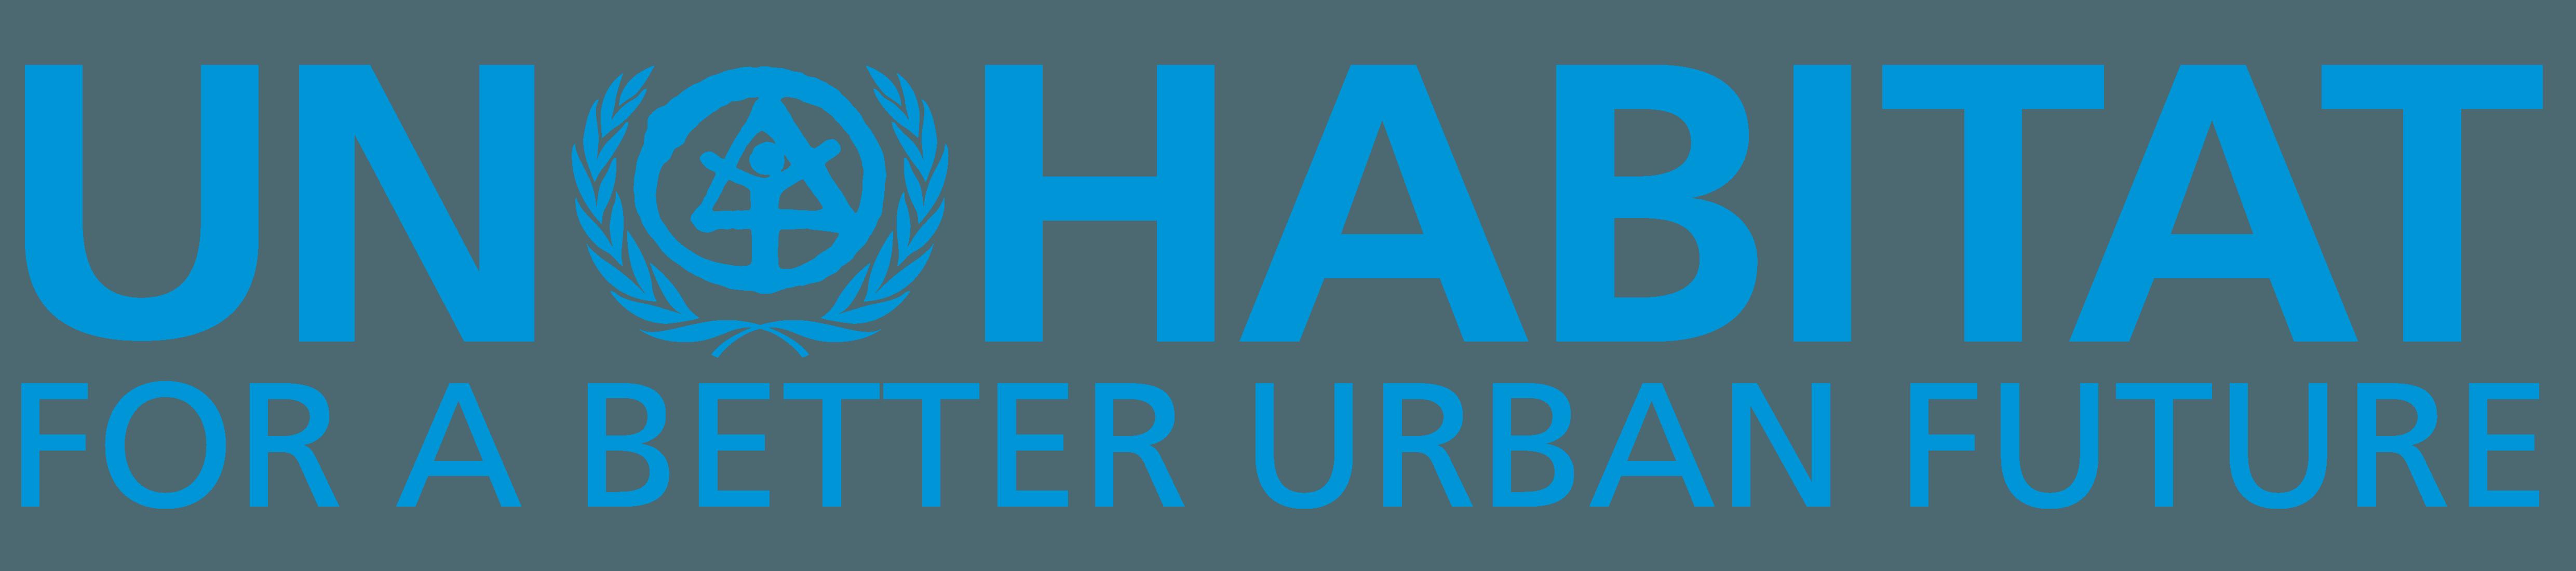 Rezultat iskanja slik za un habitat logo